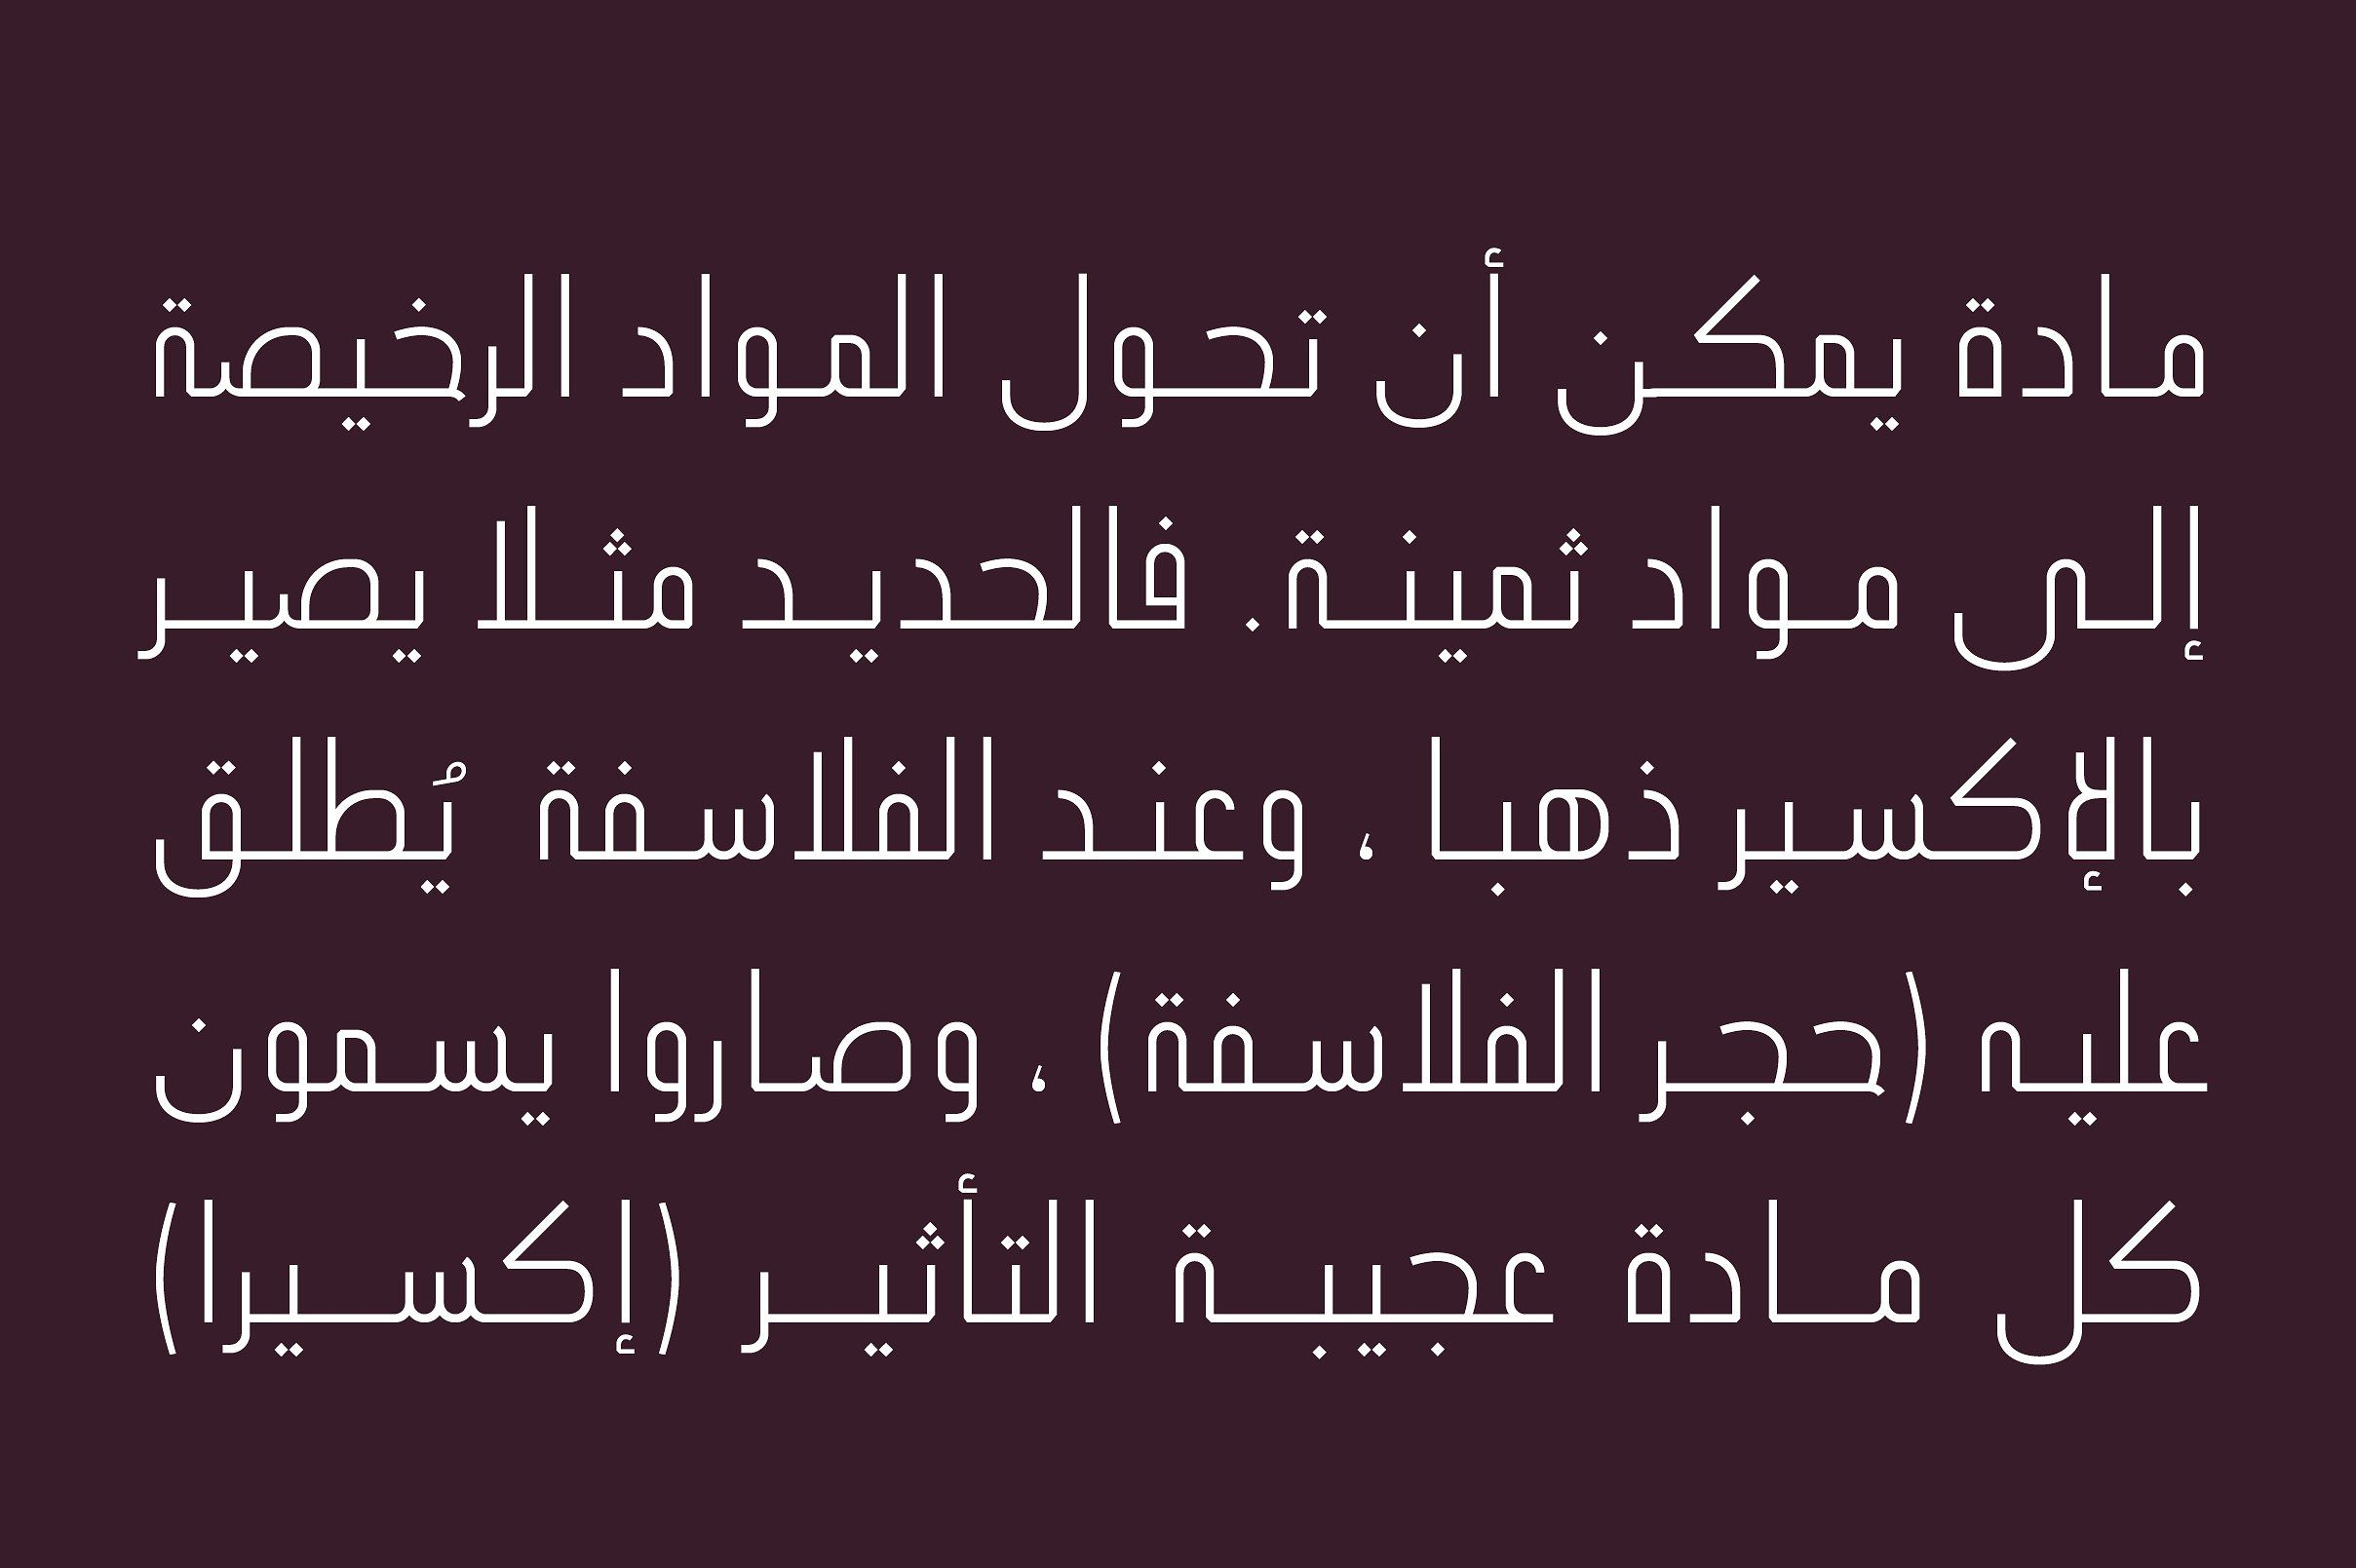 Download Ikseer - Arabic Typeface by Mostafa El Abasiry on ...